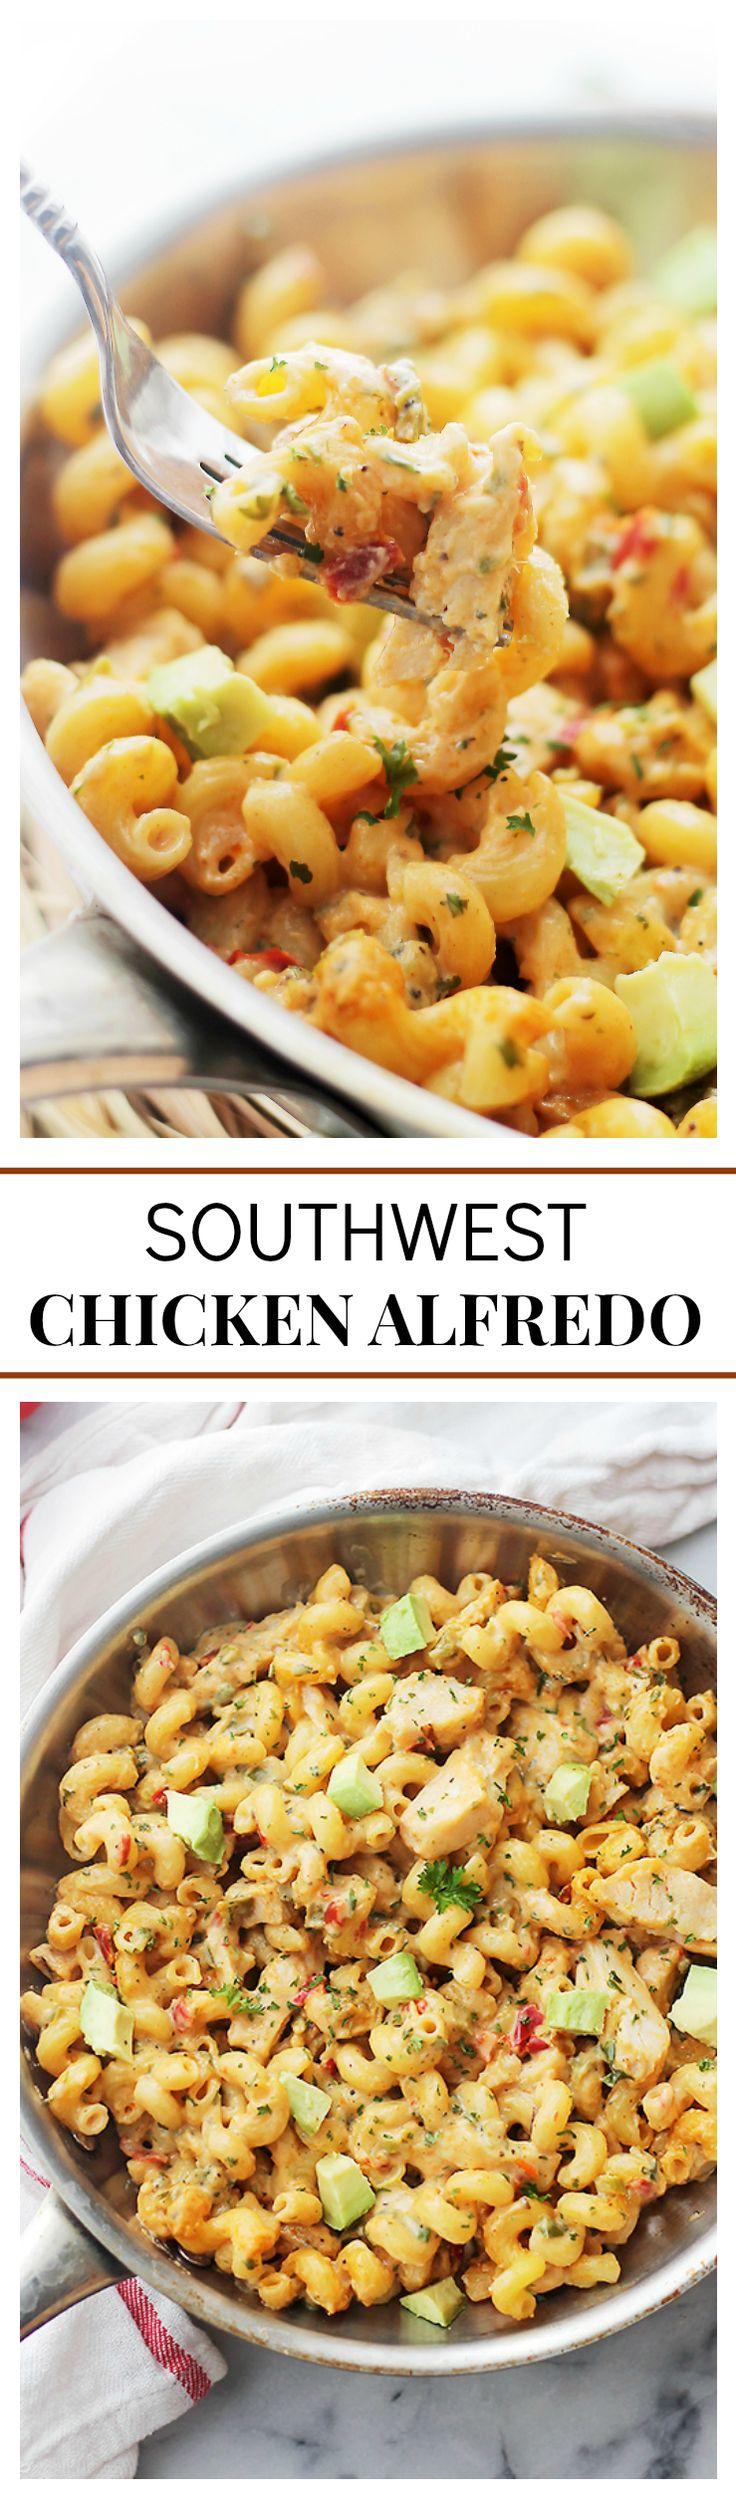 Southwest Chicken Alfredo | www.diethood.com | Easy, creamy and delicious pasta dish with spicy chicken, veggies, homemade alfredo sauce and cavatappi pasta. SO darn good!!